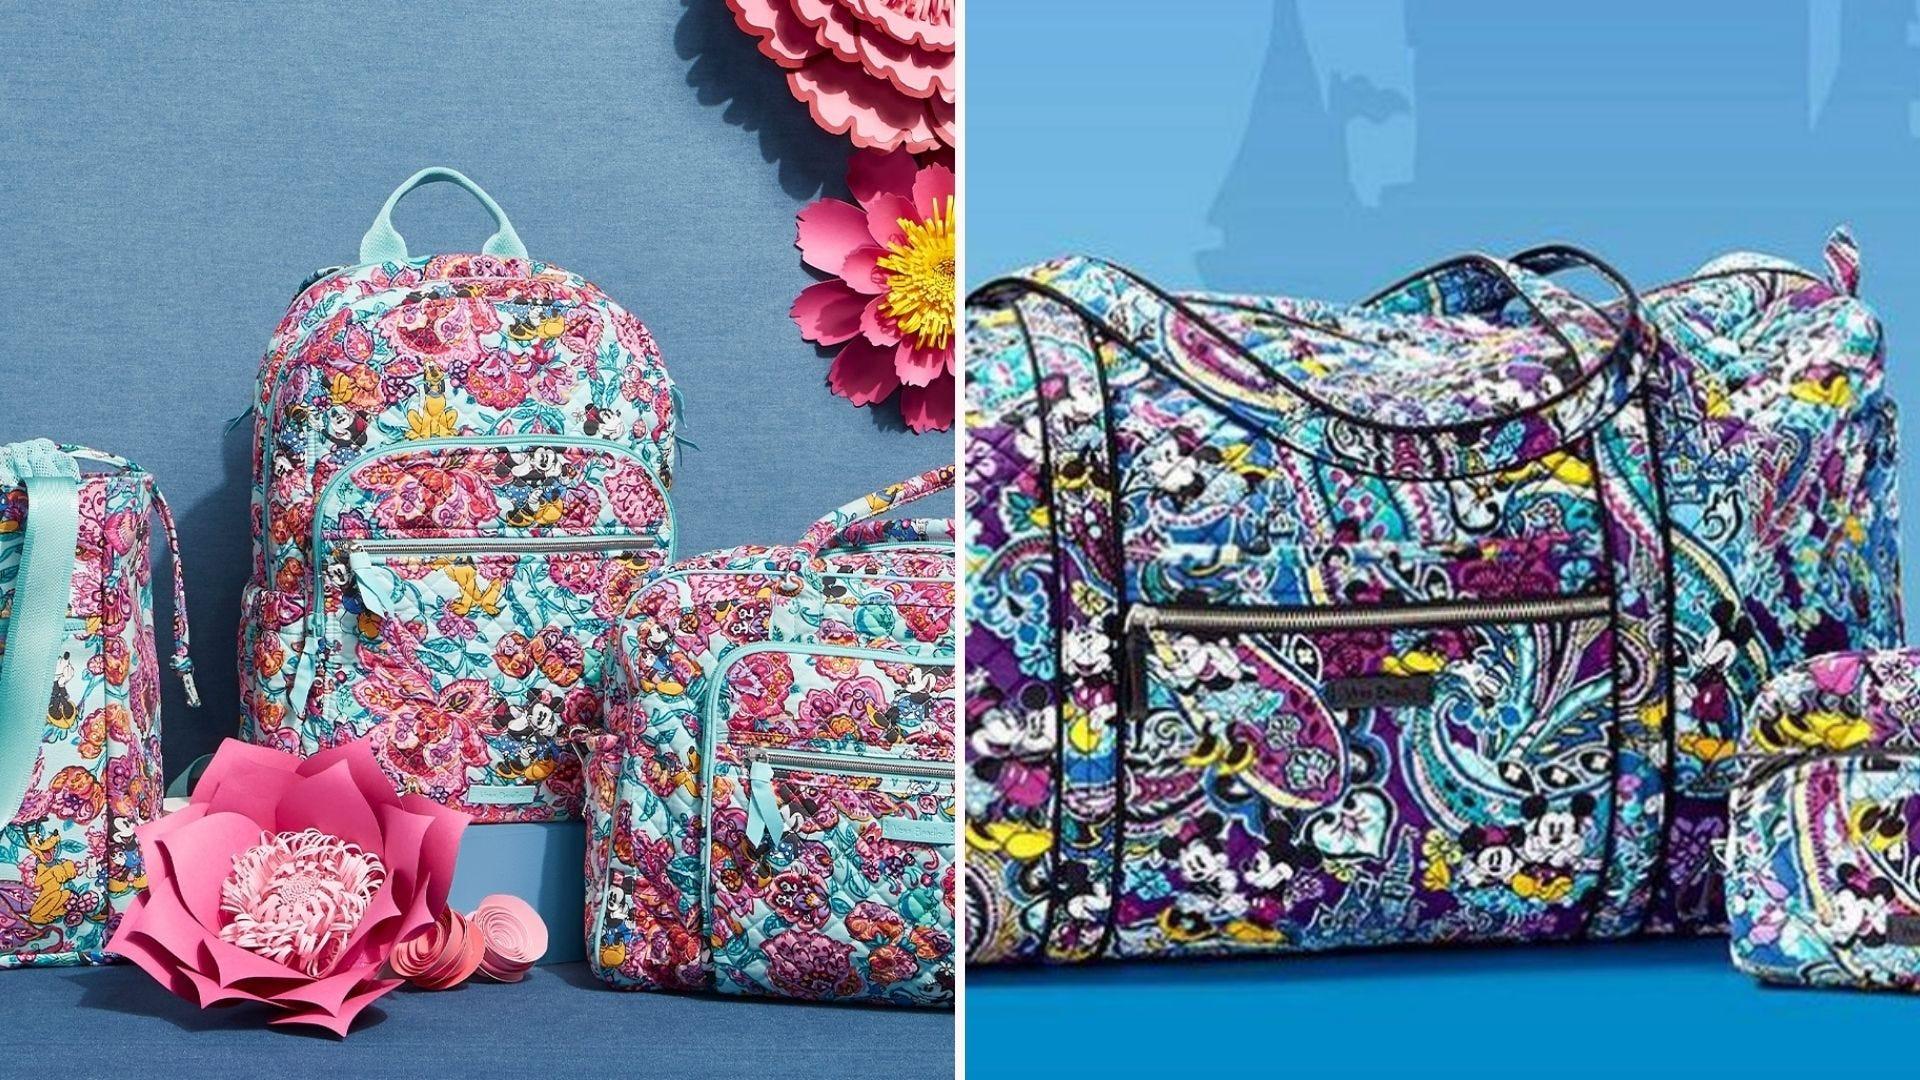 A set of pink and blue Disney-print backpacks; a blue-and-purple Disney print duffel